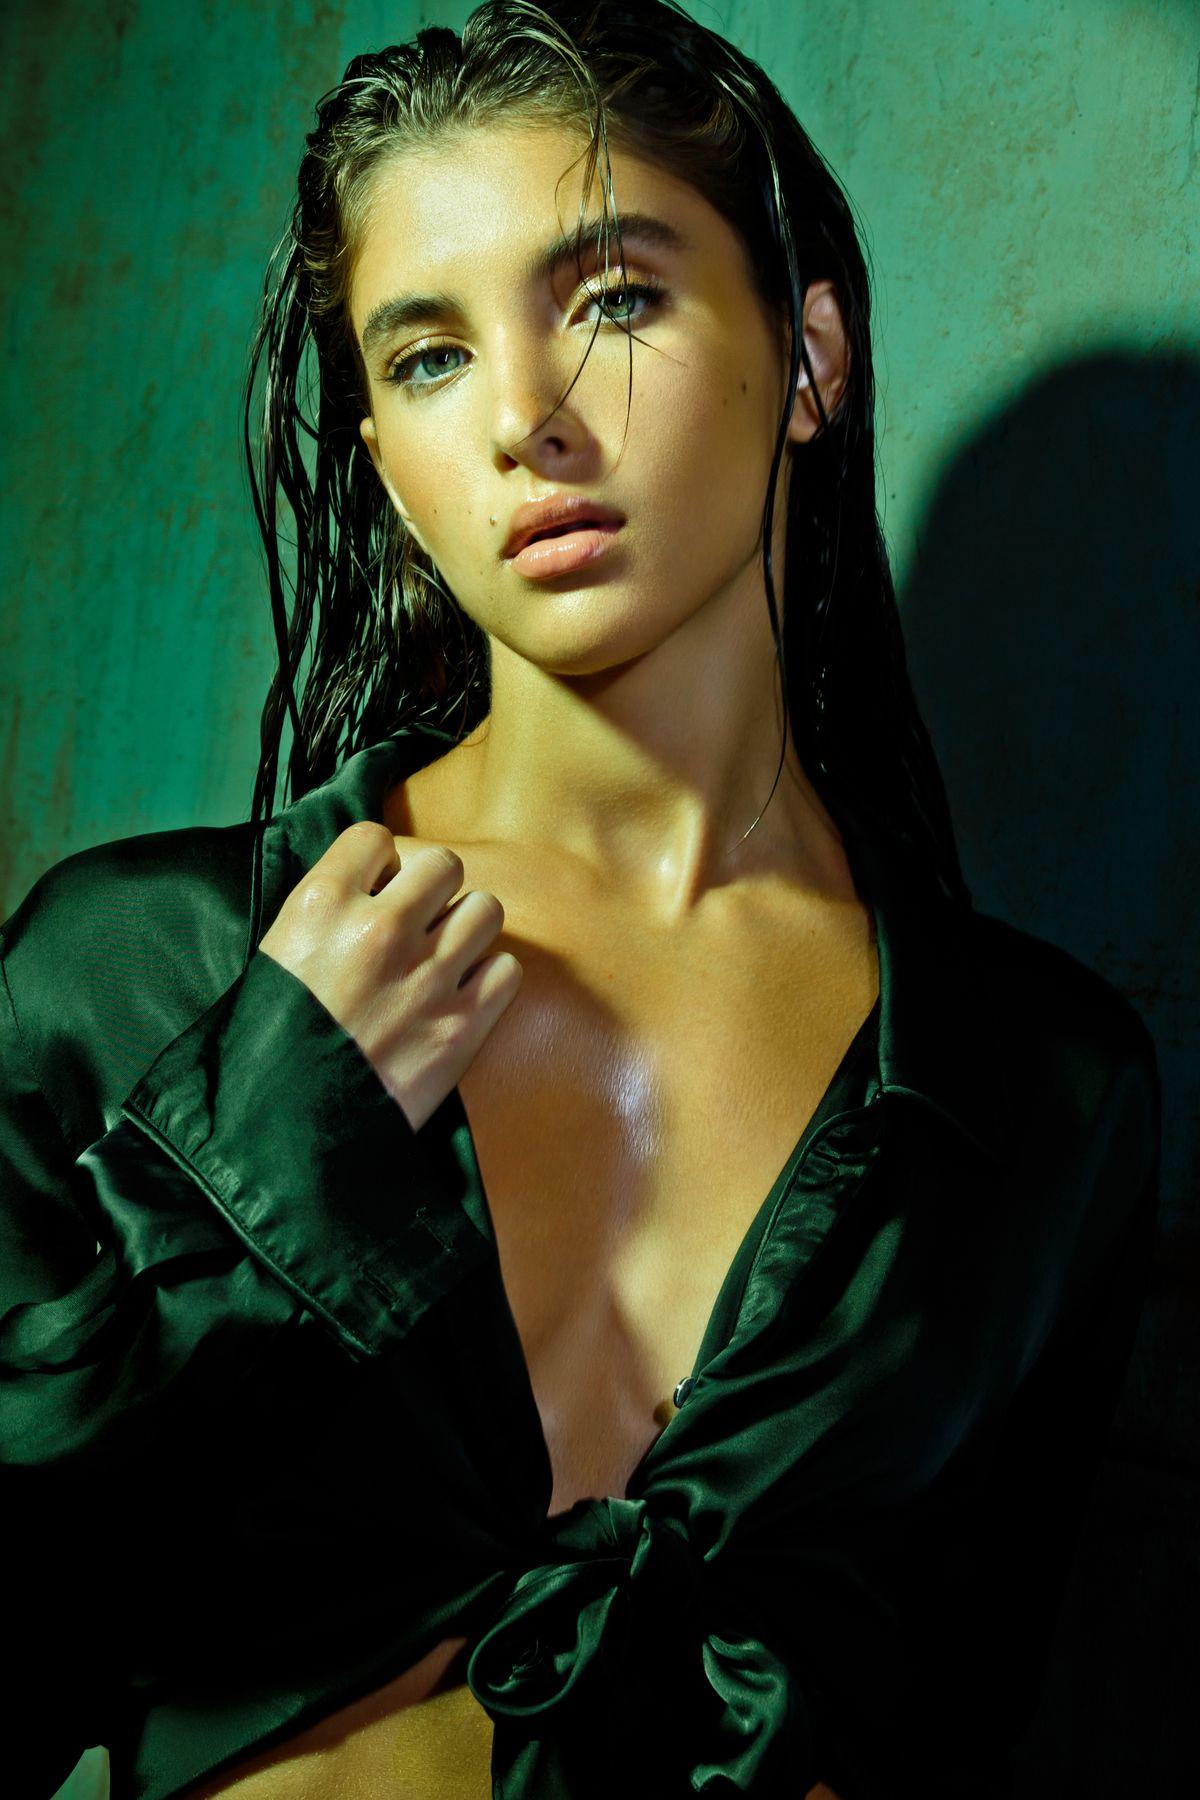 Model Emerson Glazer